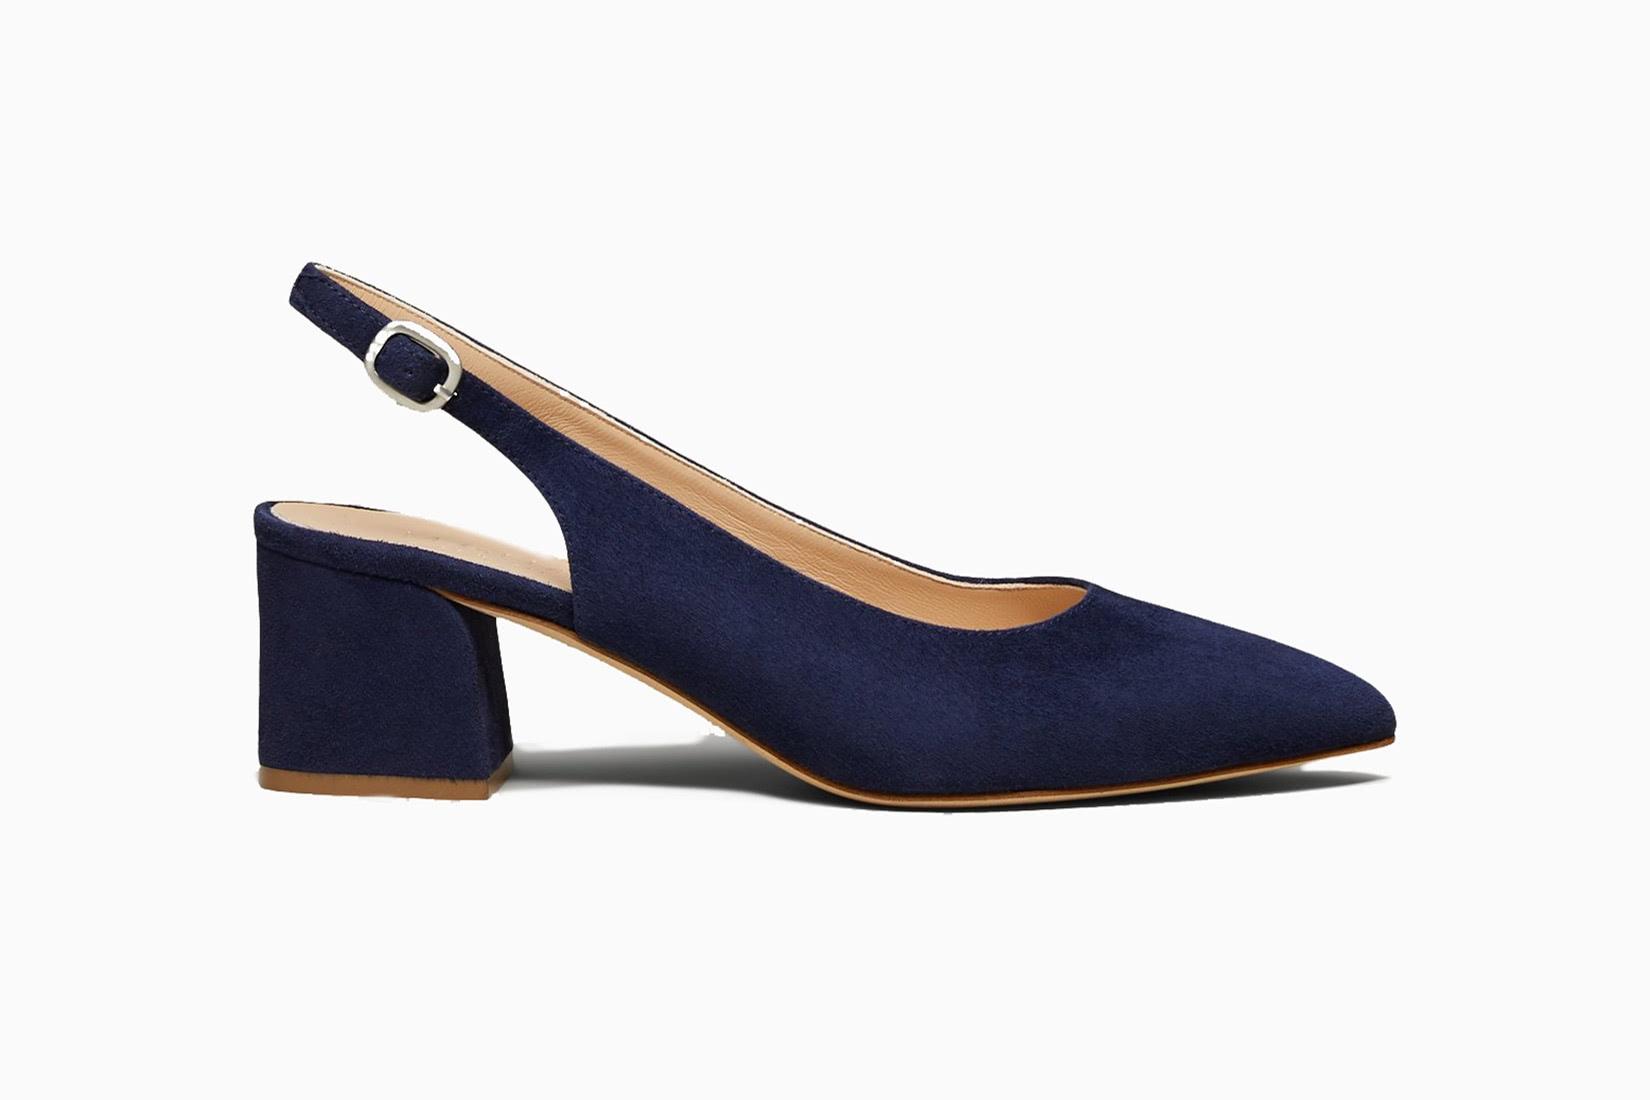 most comfortable heels standing m.gemi penna concavo - Luxe Digital